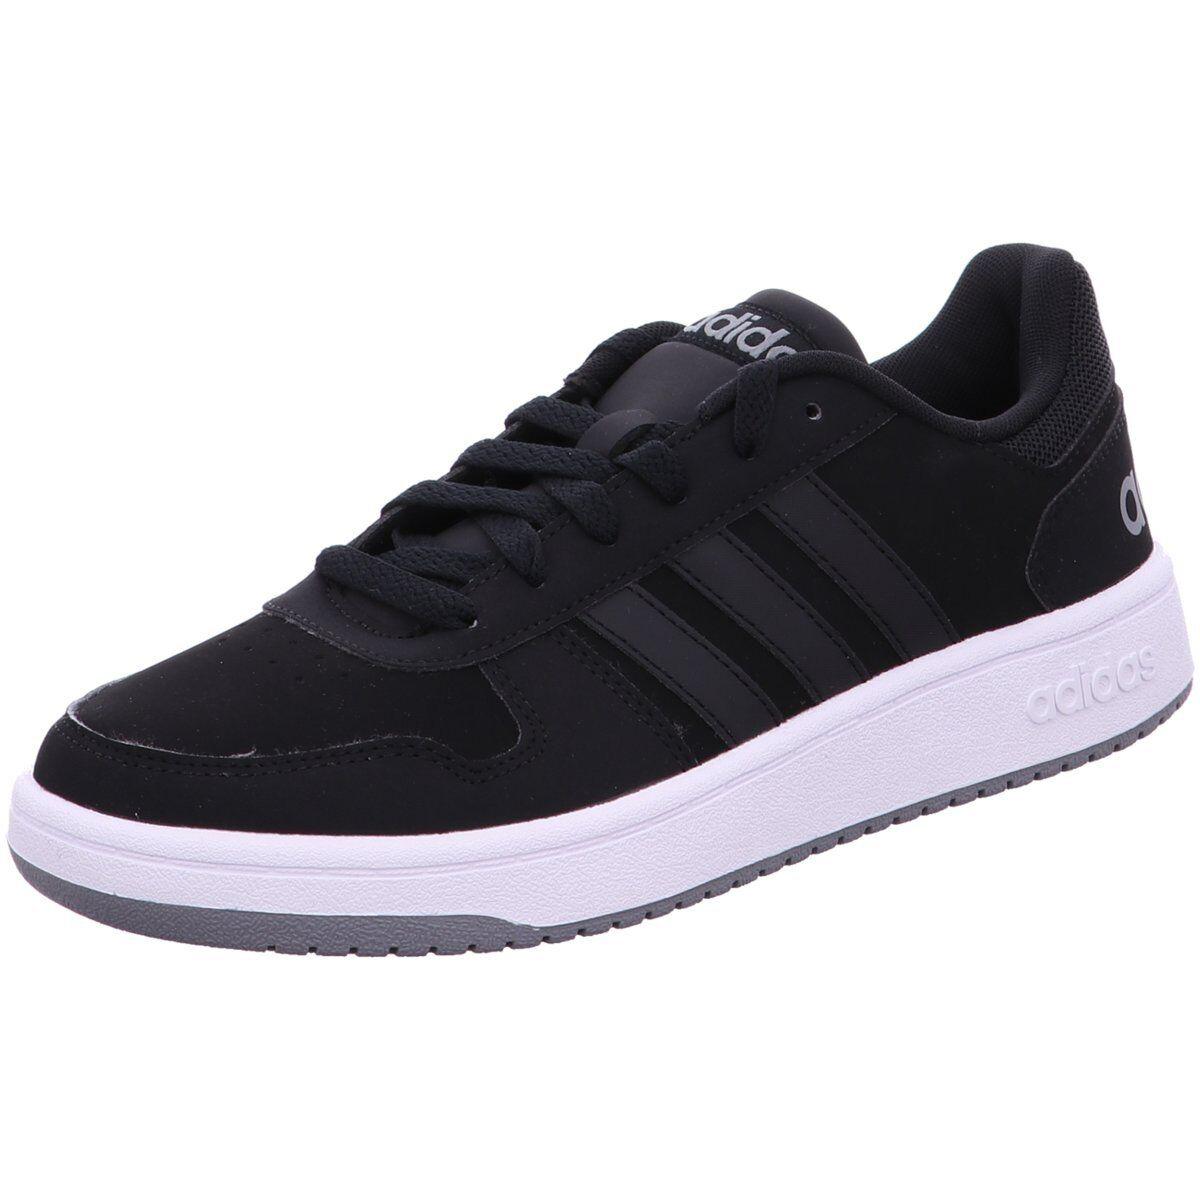 NEU adidas Herren Sneaker VS Hoops 2.0 DB0122-Hoops-2.0 schwarz 426167